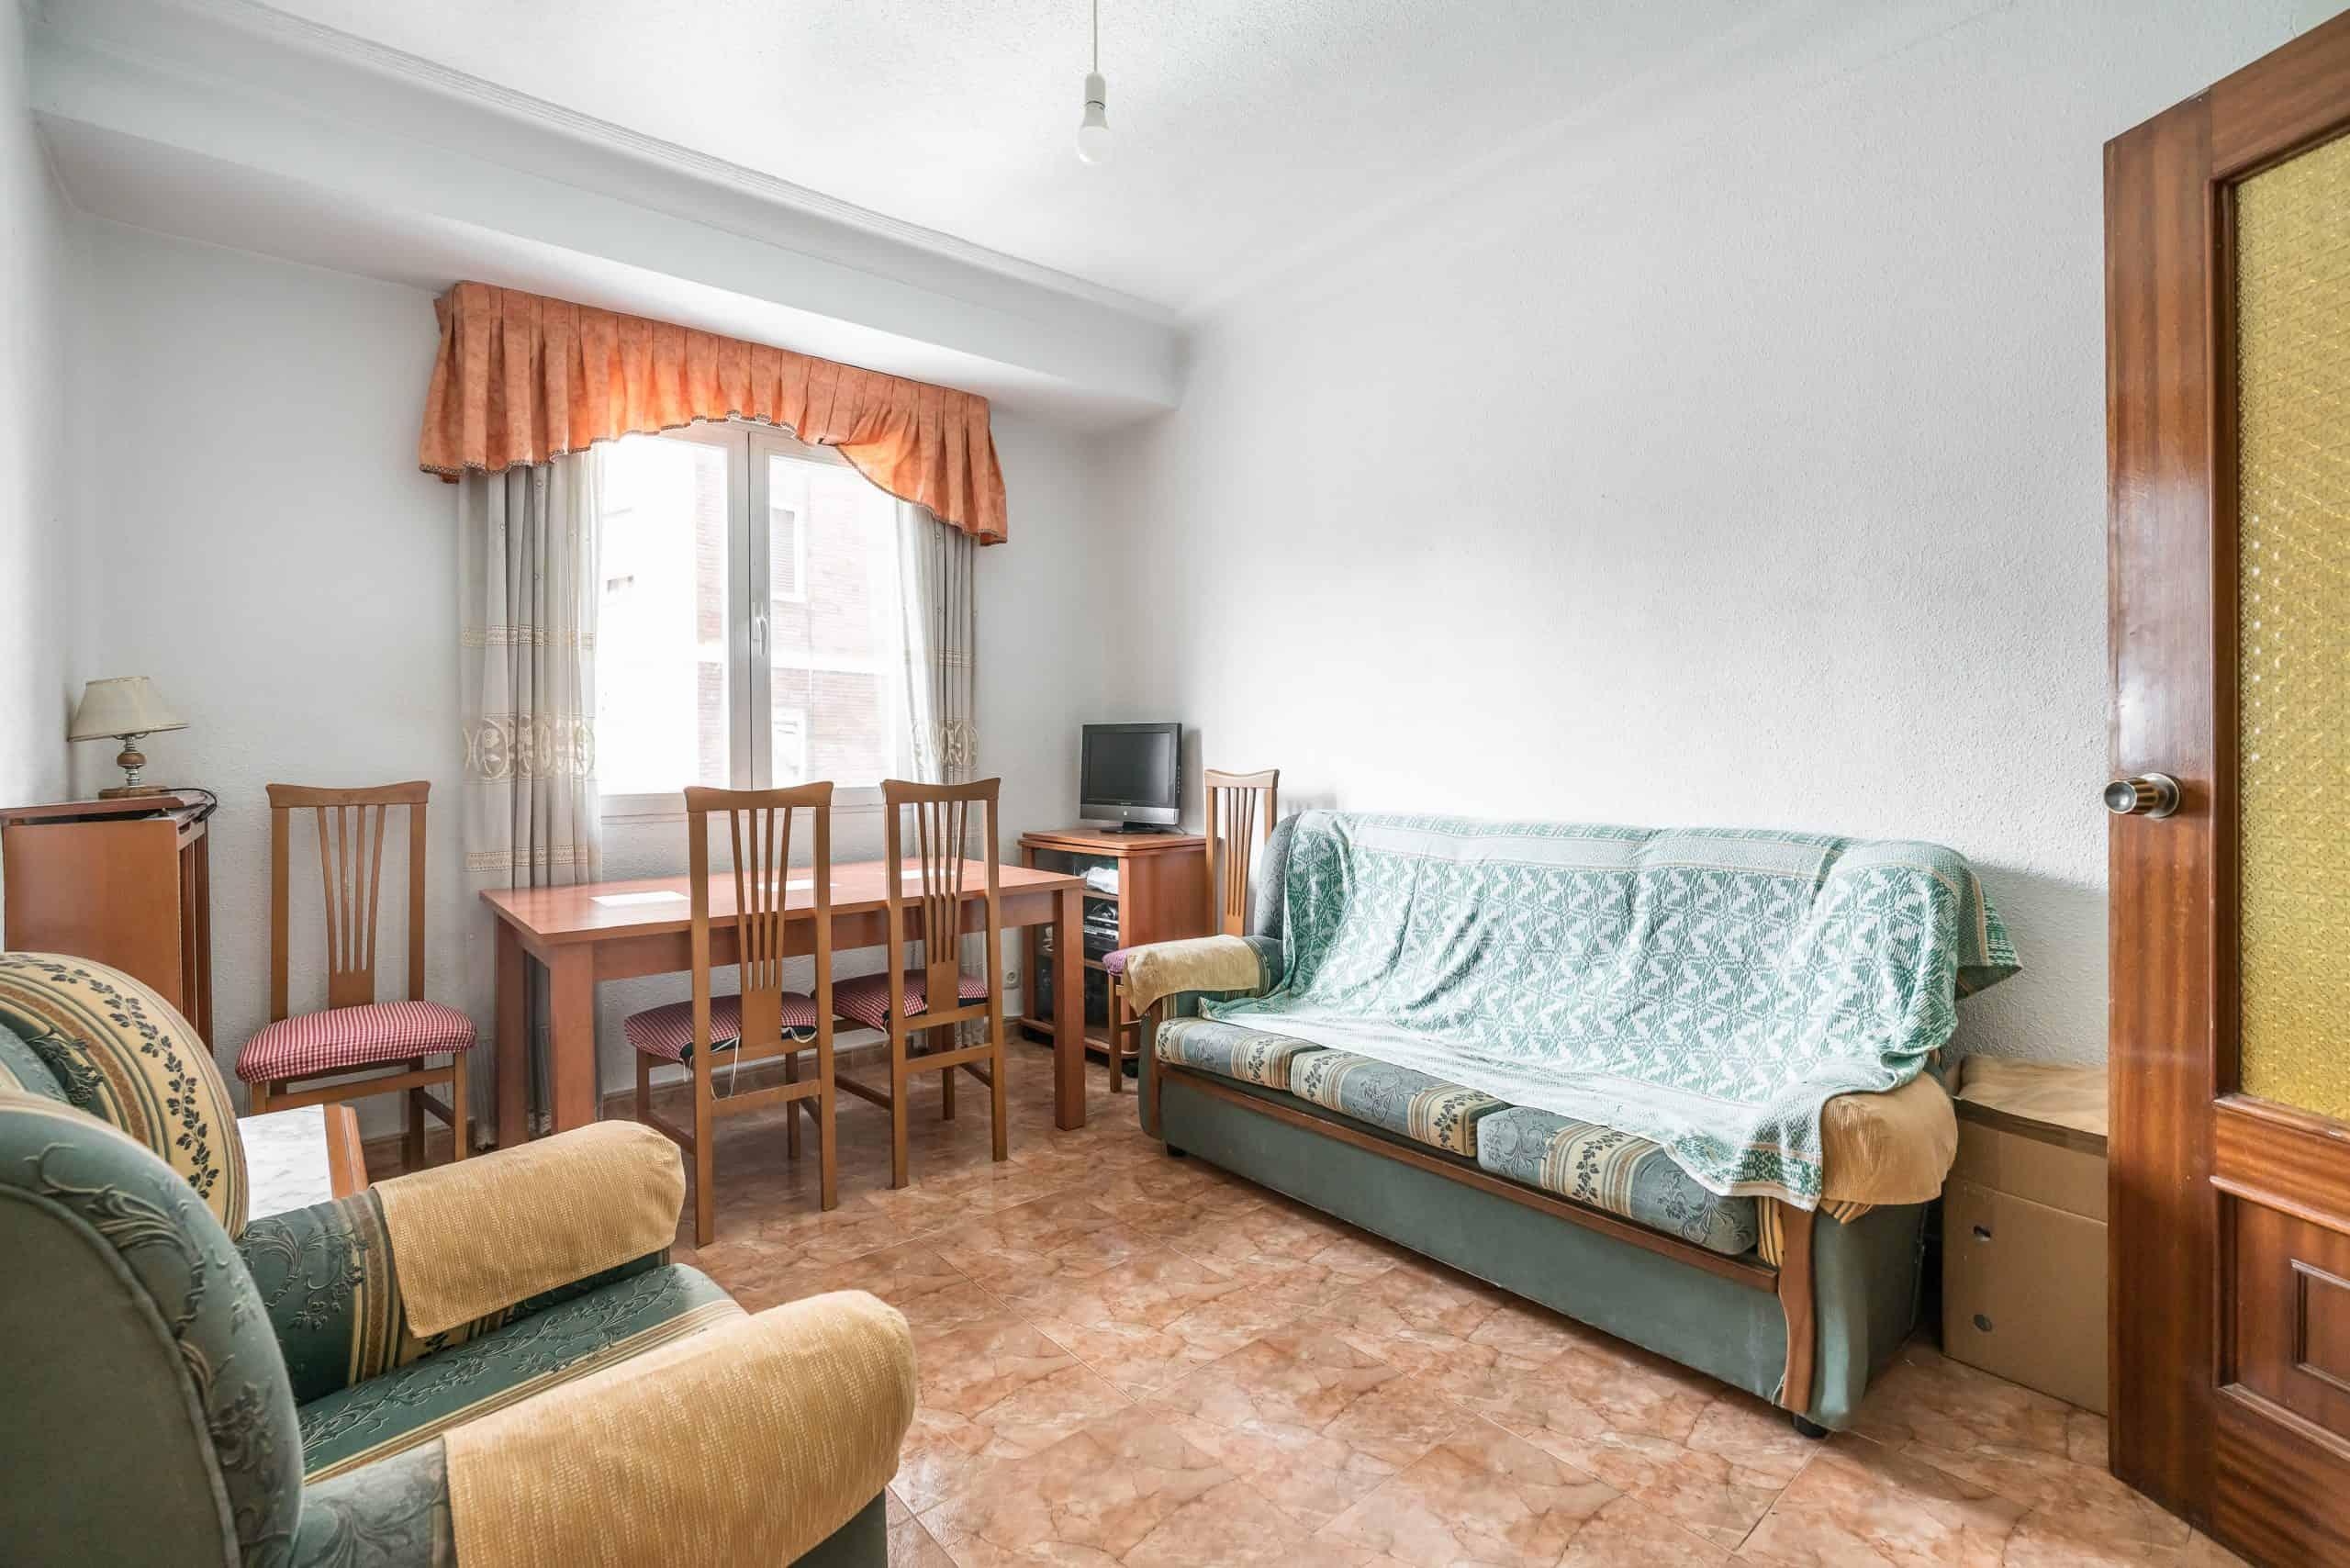 Agencia Inmobiliaria de Madrid-FUTUROCASA-calle Embajadores-Chopera-Arganzuela1 SALON (3)